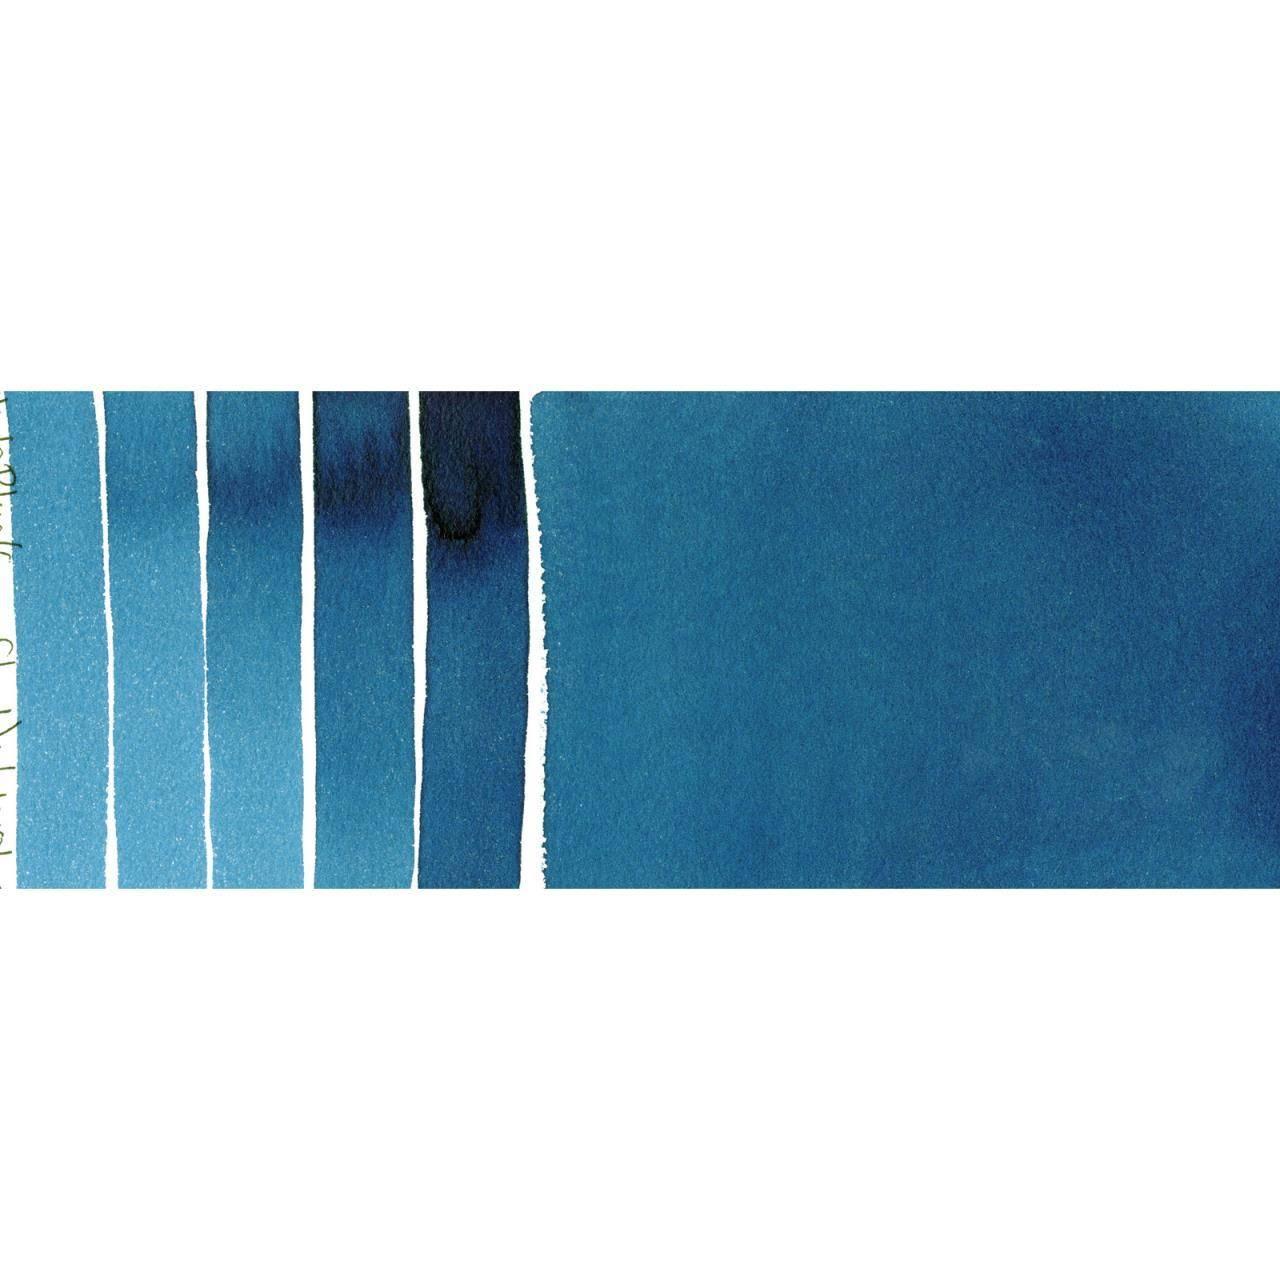 Daniel Smith Phthalo Blue - Green Shade